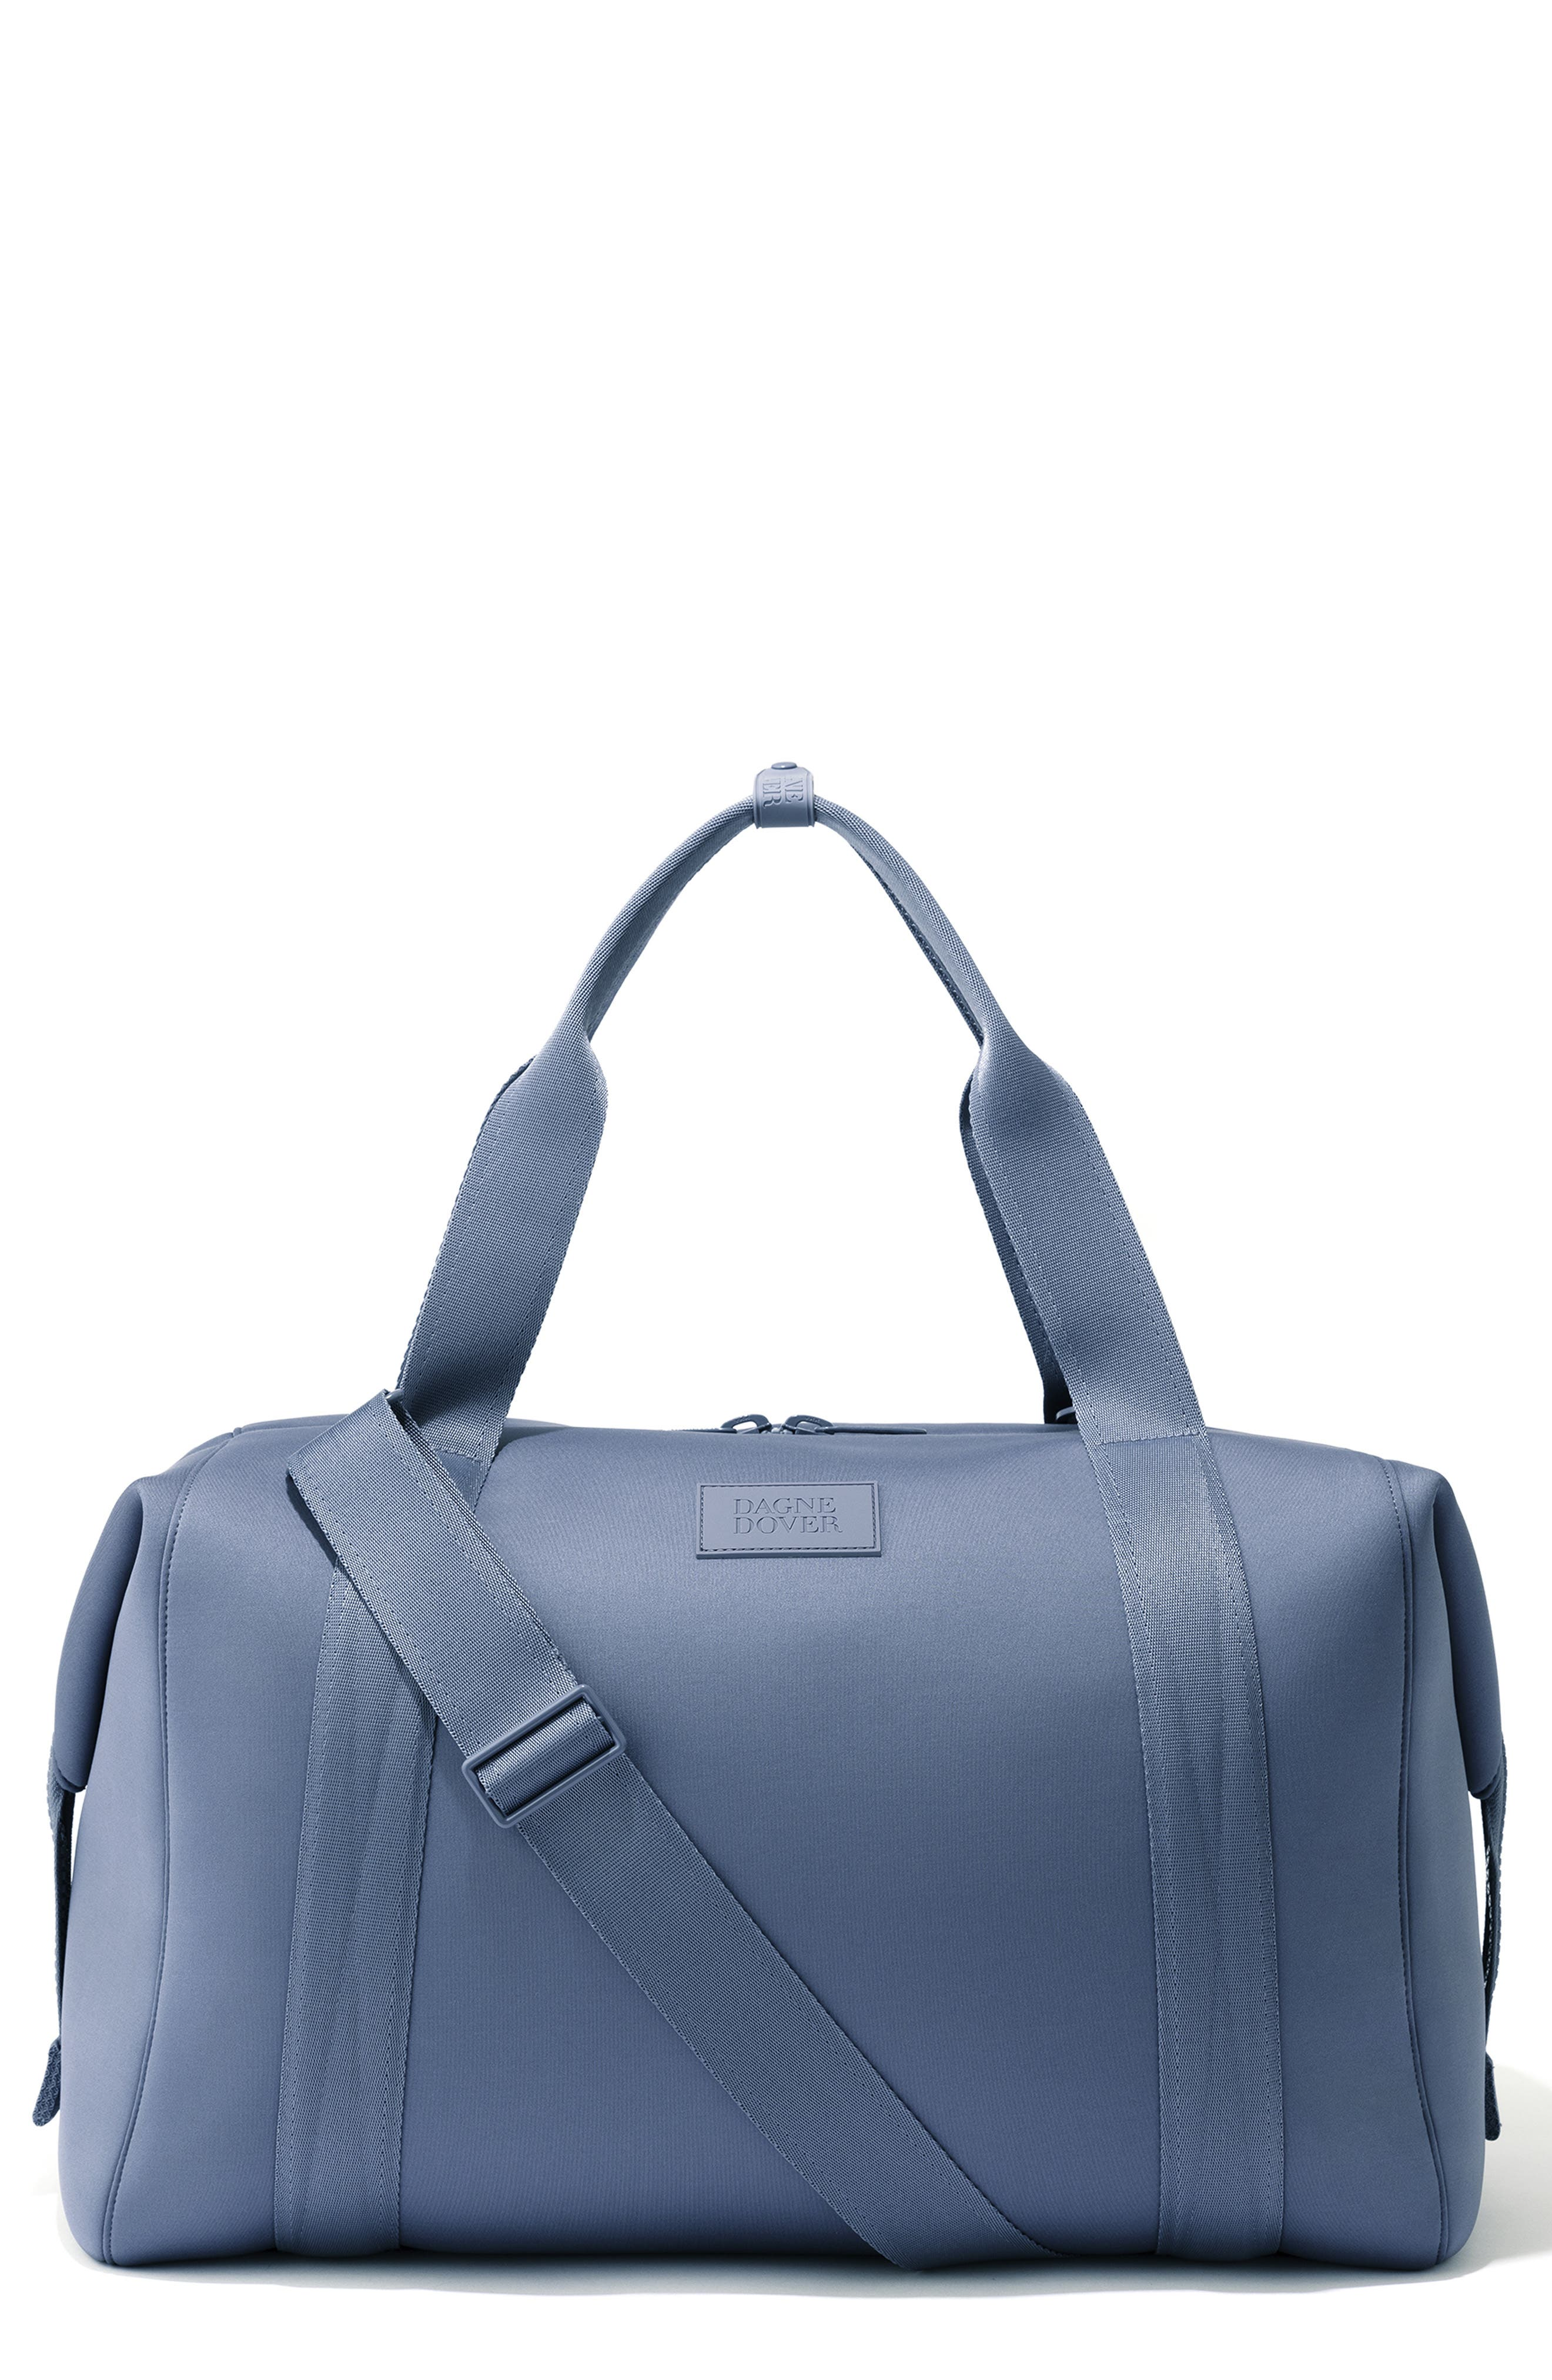 DAGNE DOVER Xl Landon Carryall Duffel Bag - Blue in Storm